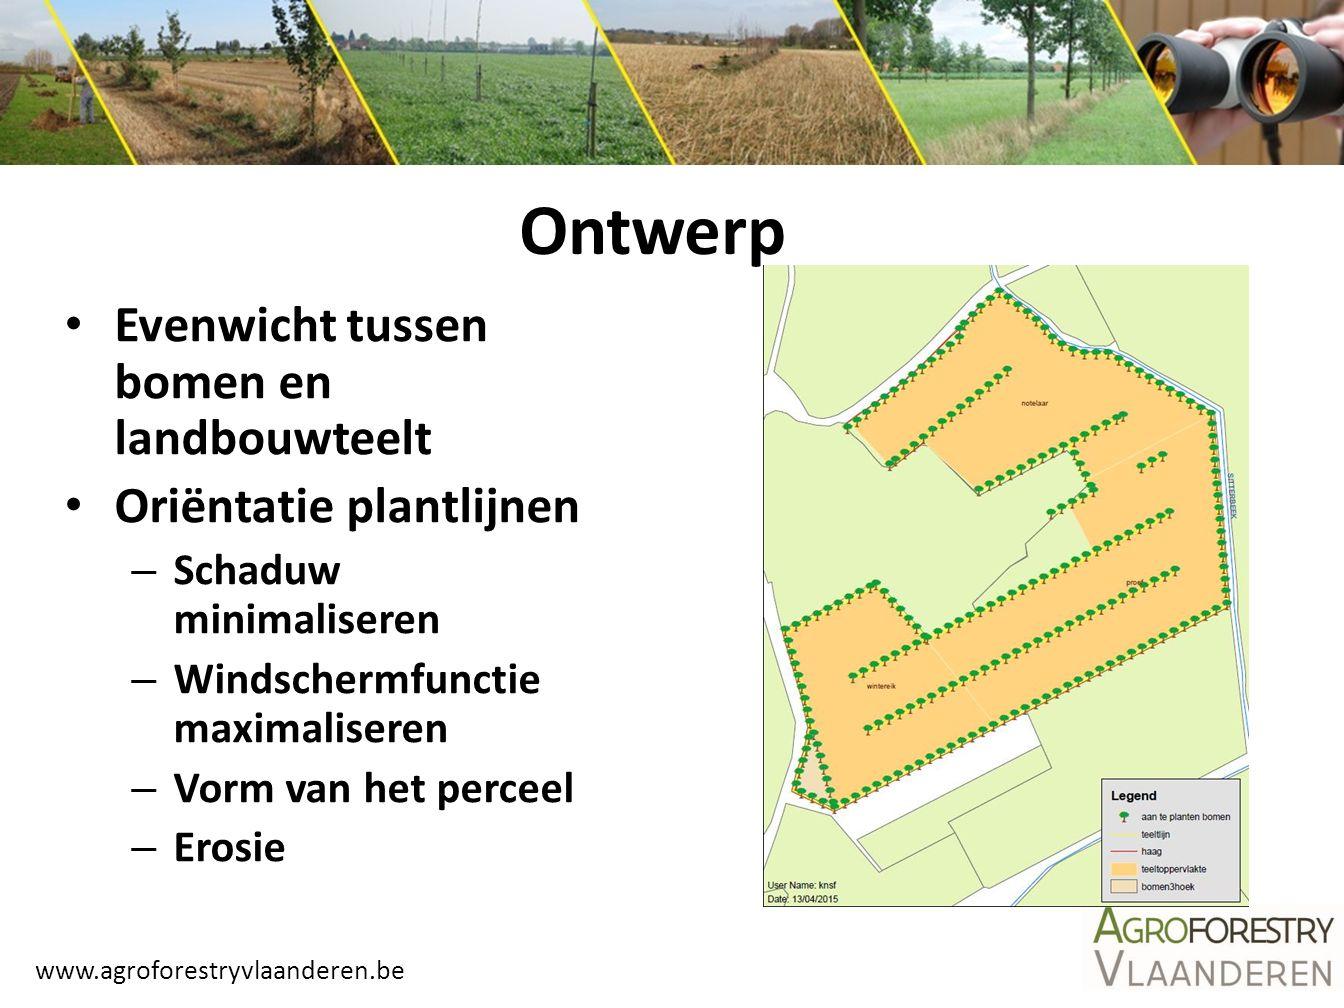 Ontwerp Evenwicht tussen bomen en landbouwteelt Oriëntatie plantlijnen